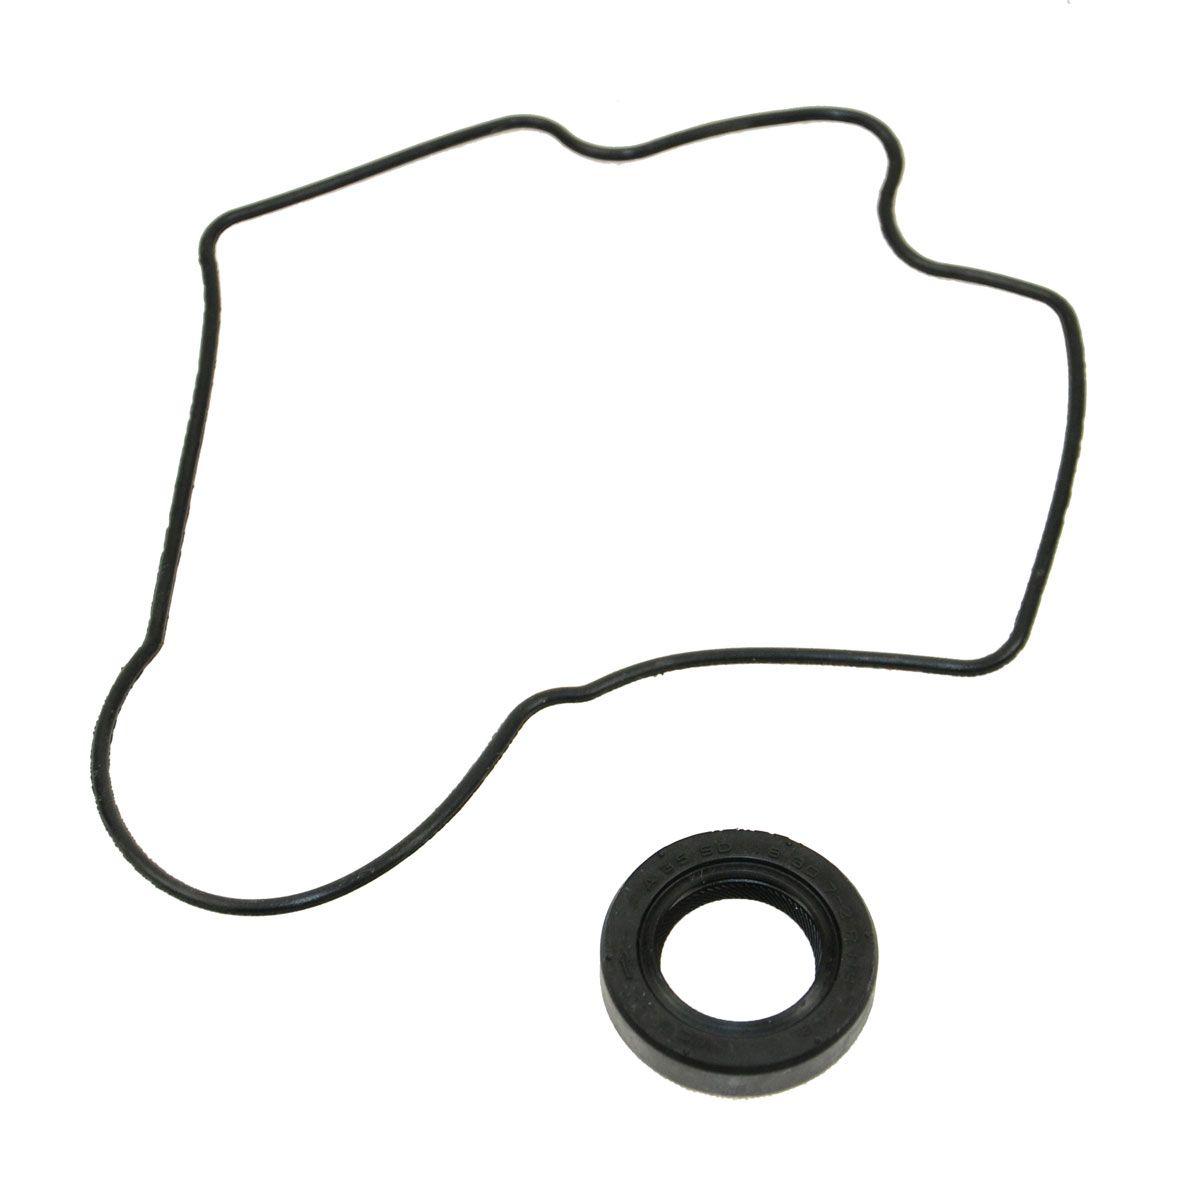 Oil Pump Seal Gasket Kit Set for Toyota Camry Solara